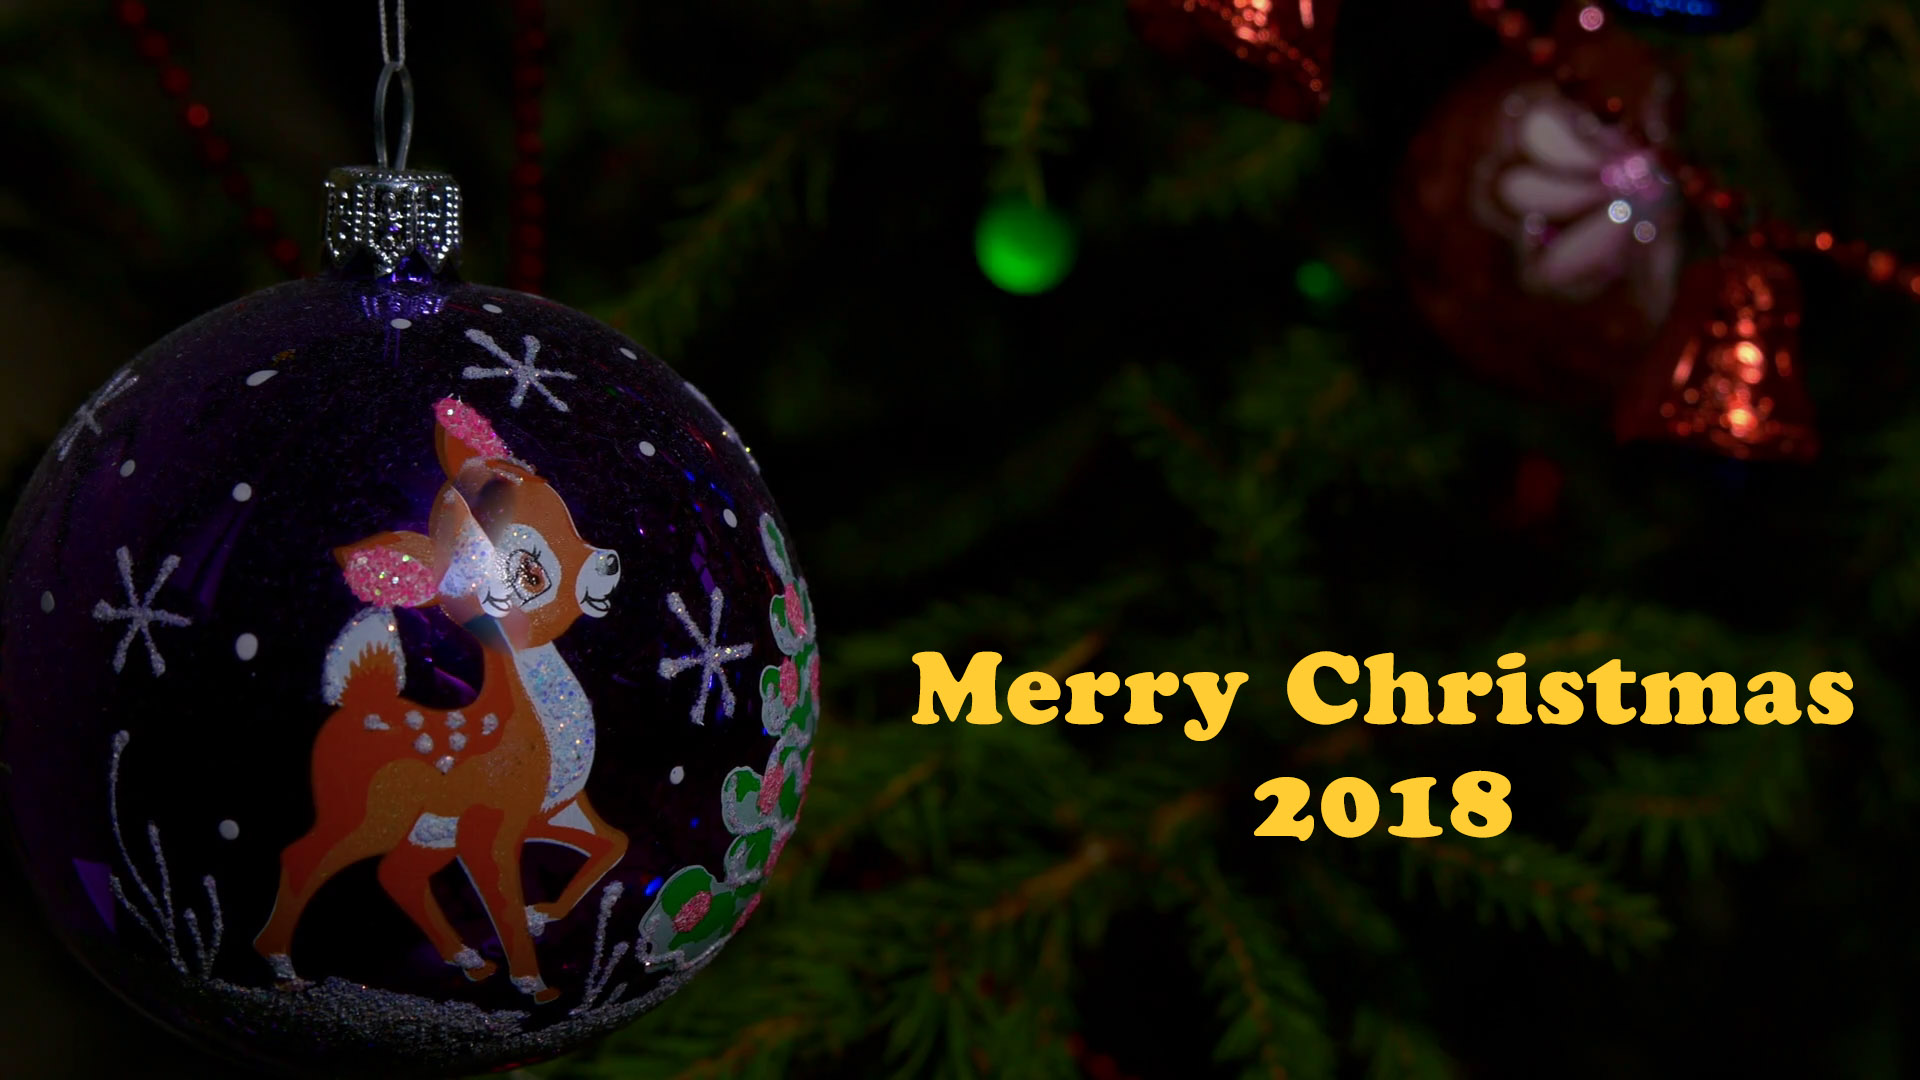 Amusing Christmas Images